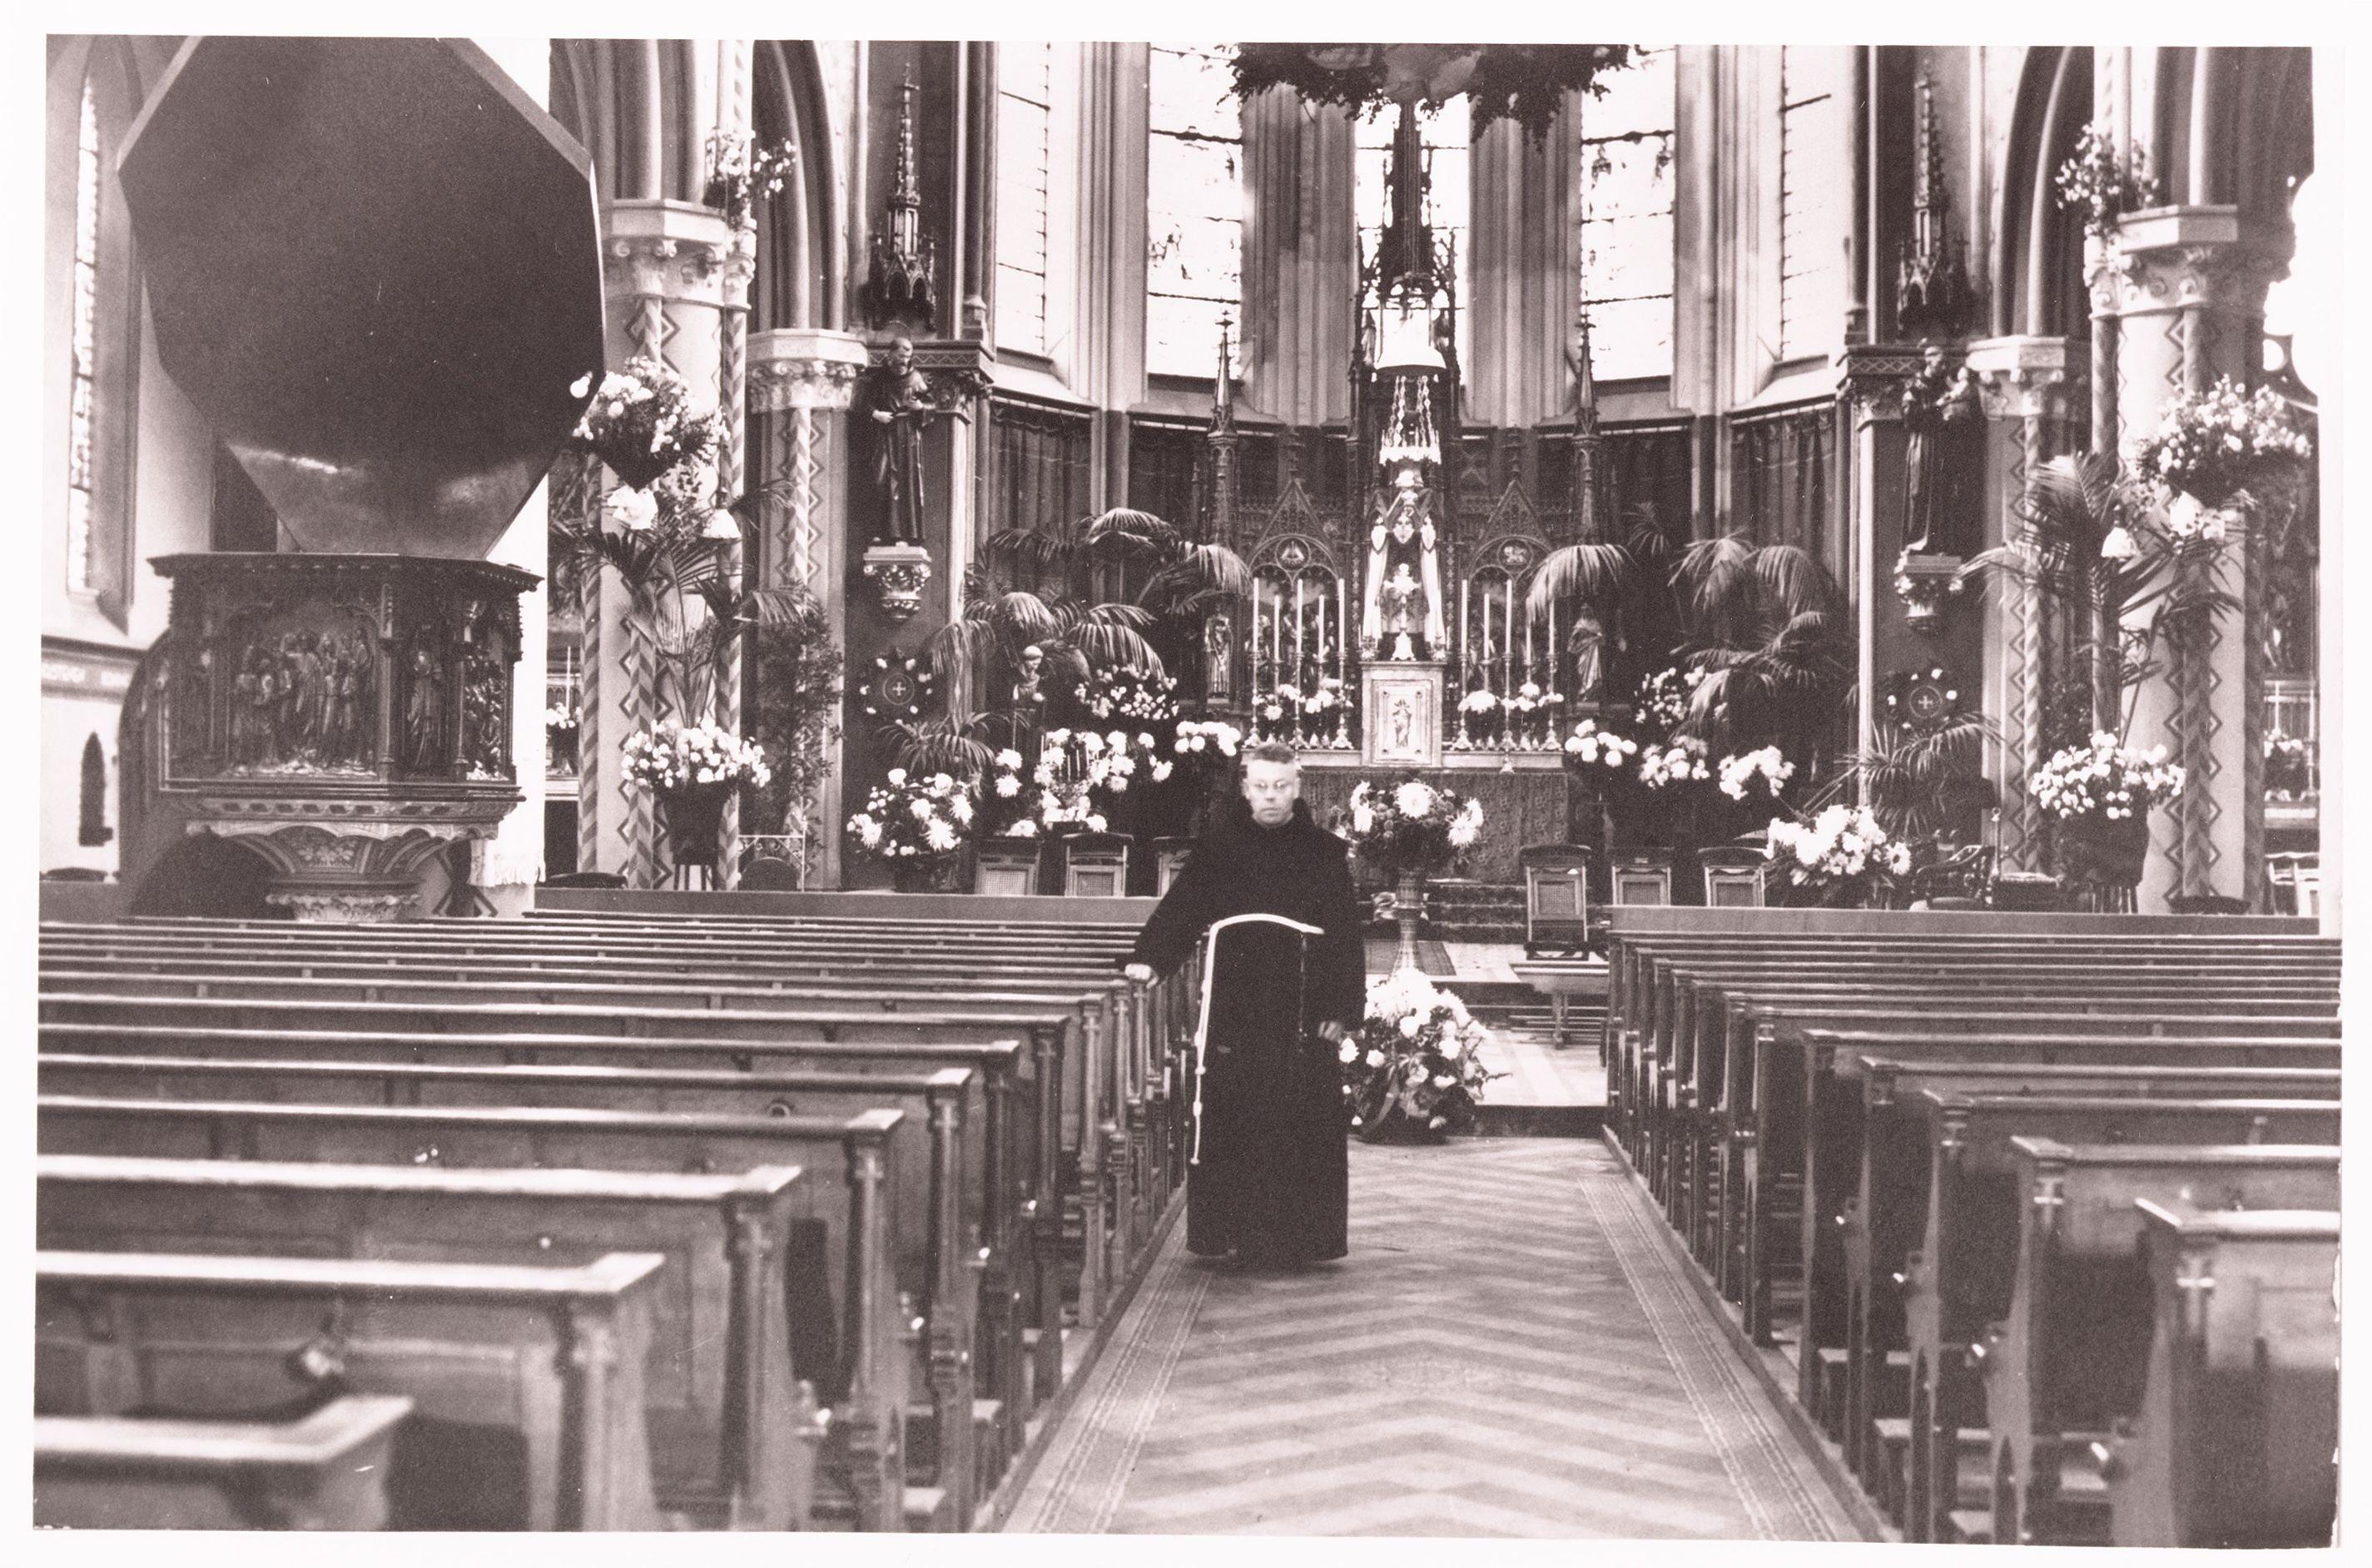 w2639 interieur bonaventurakerk 1942